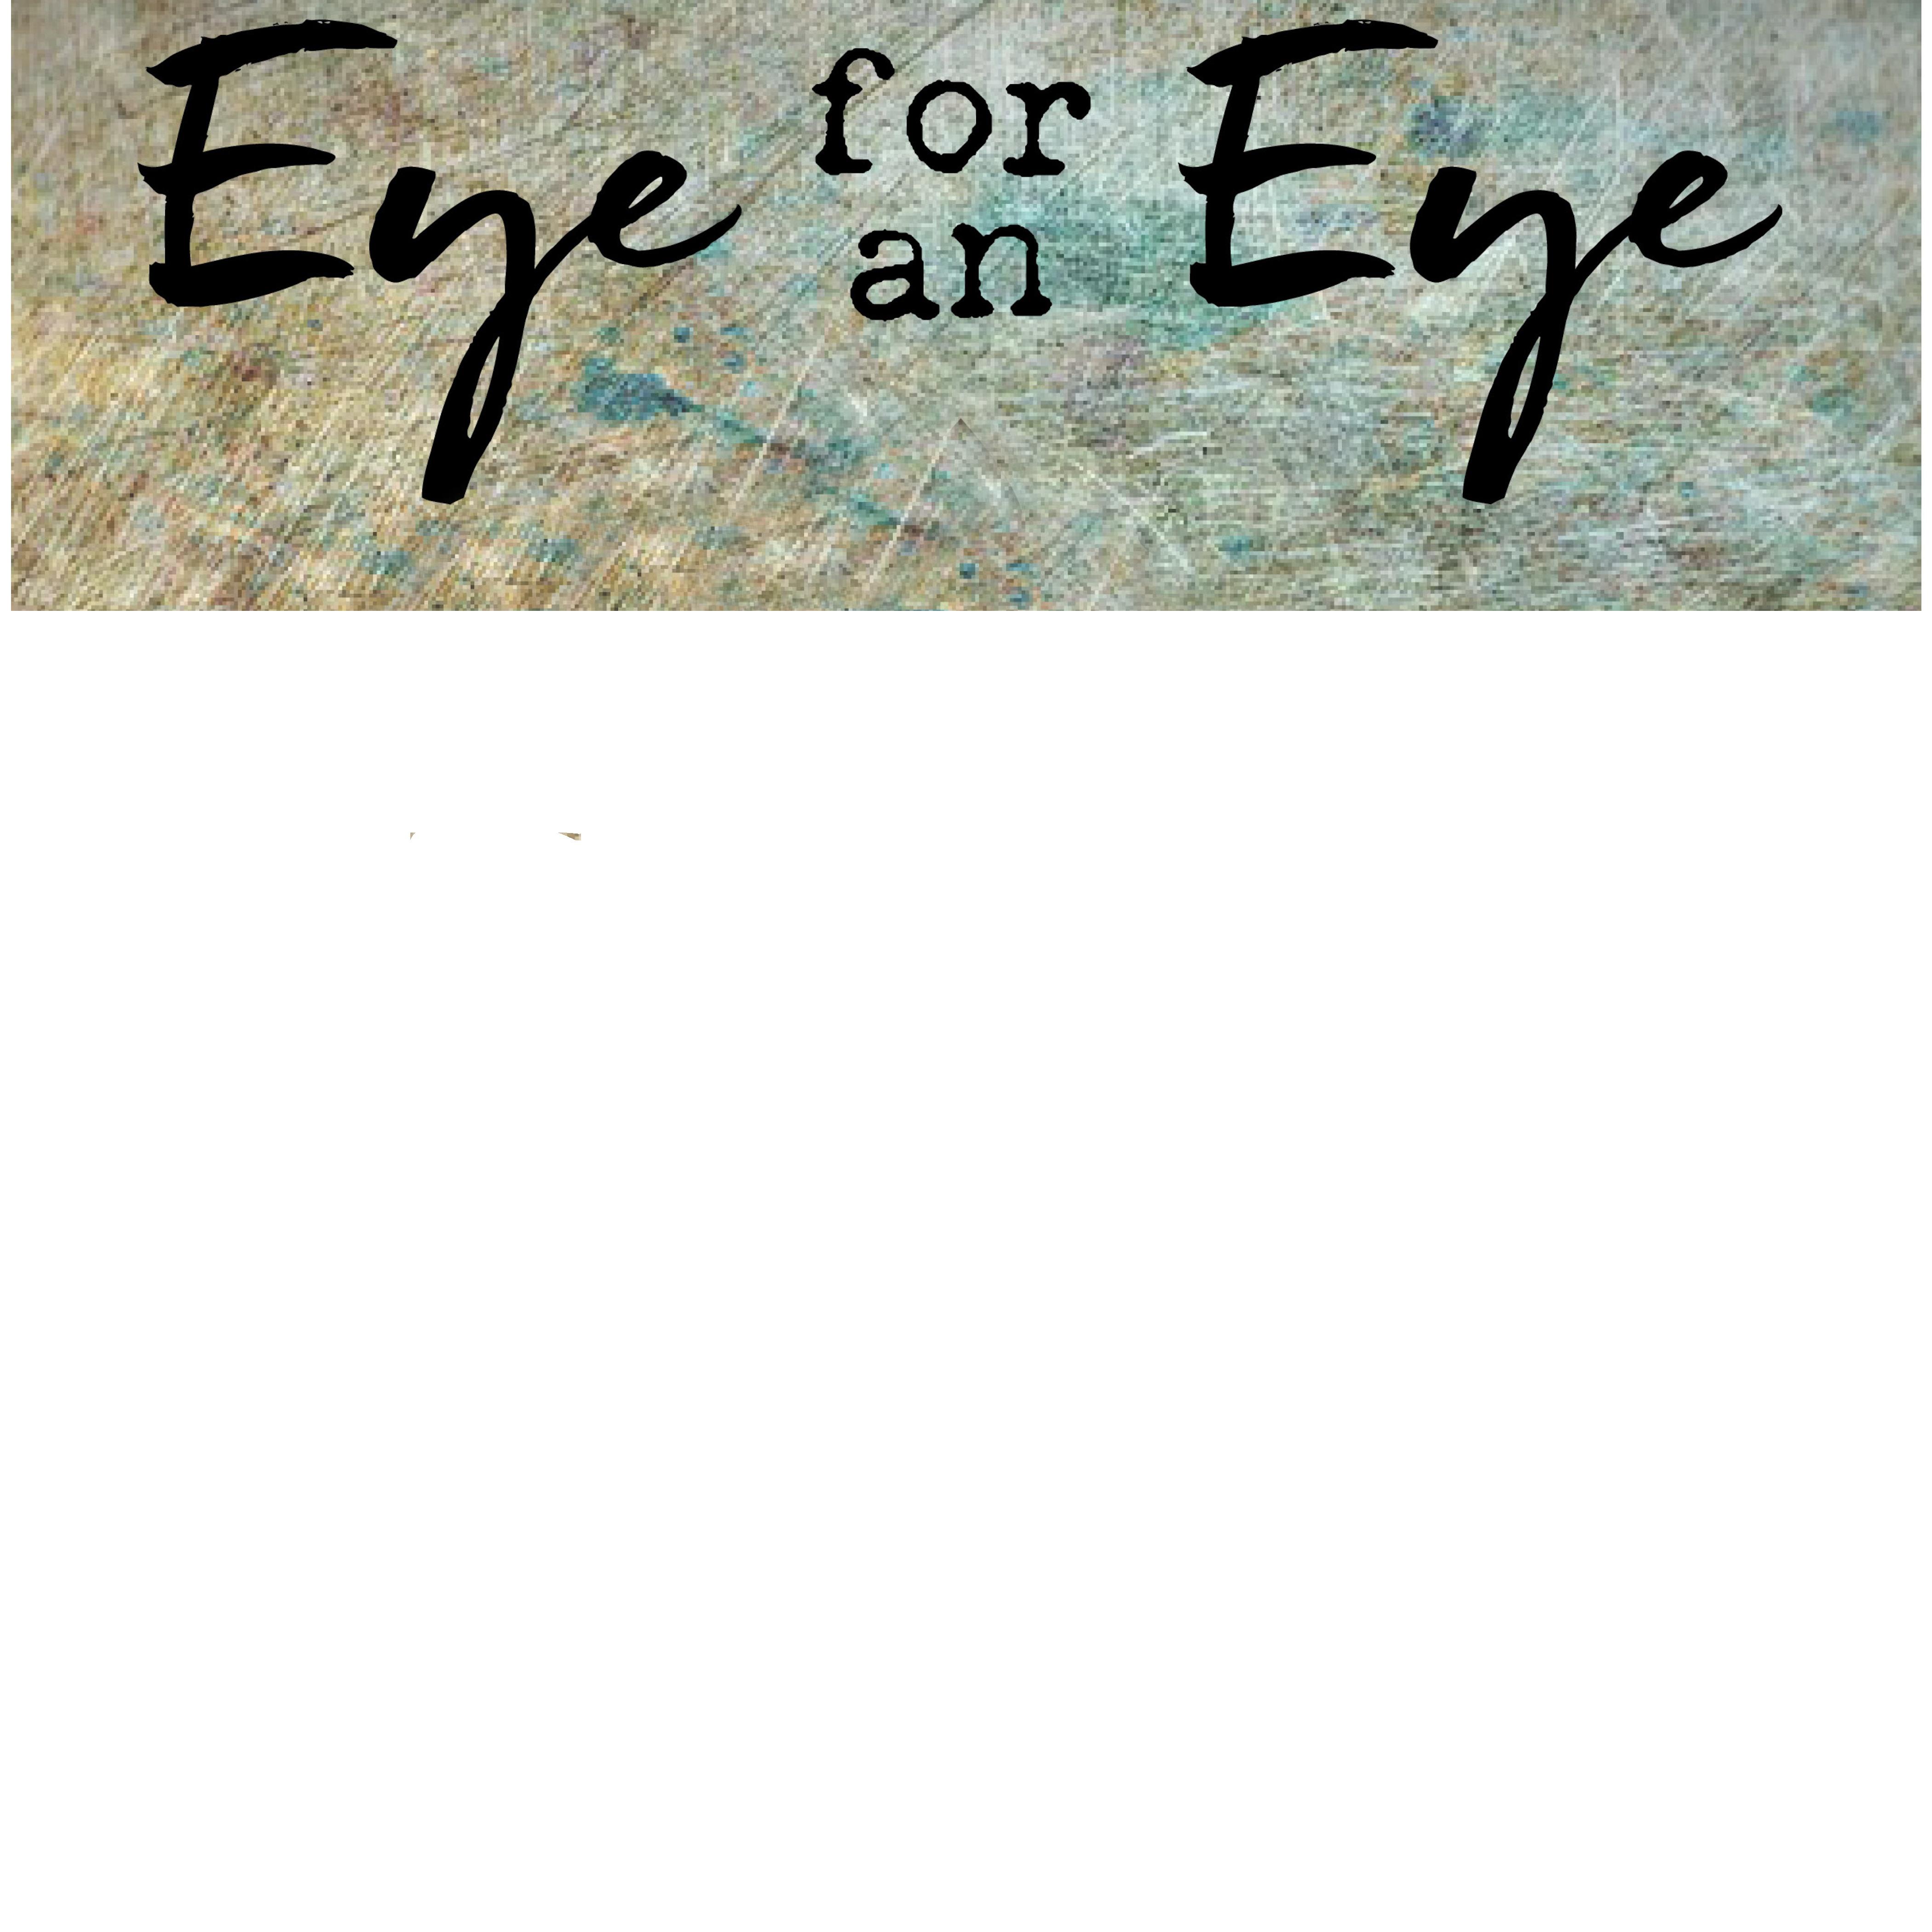 eyeforeyepod Cover